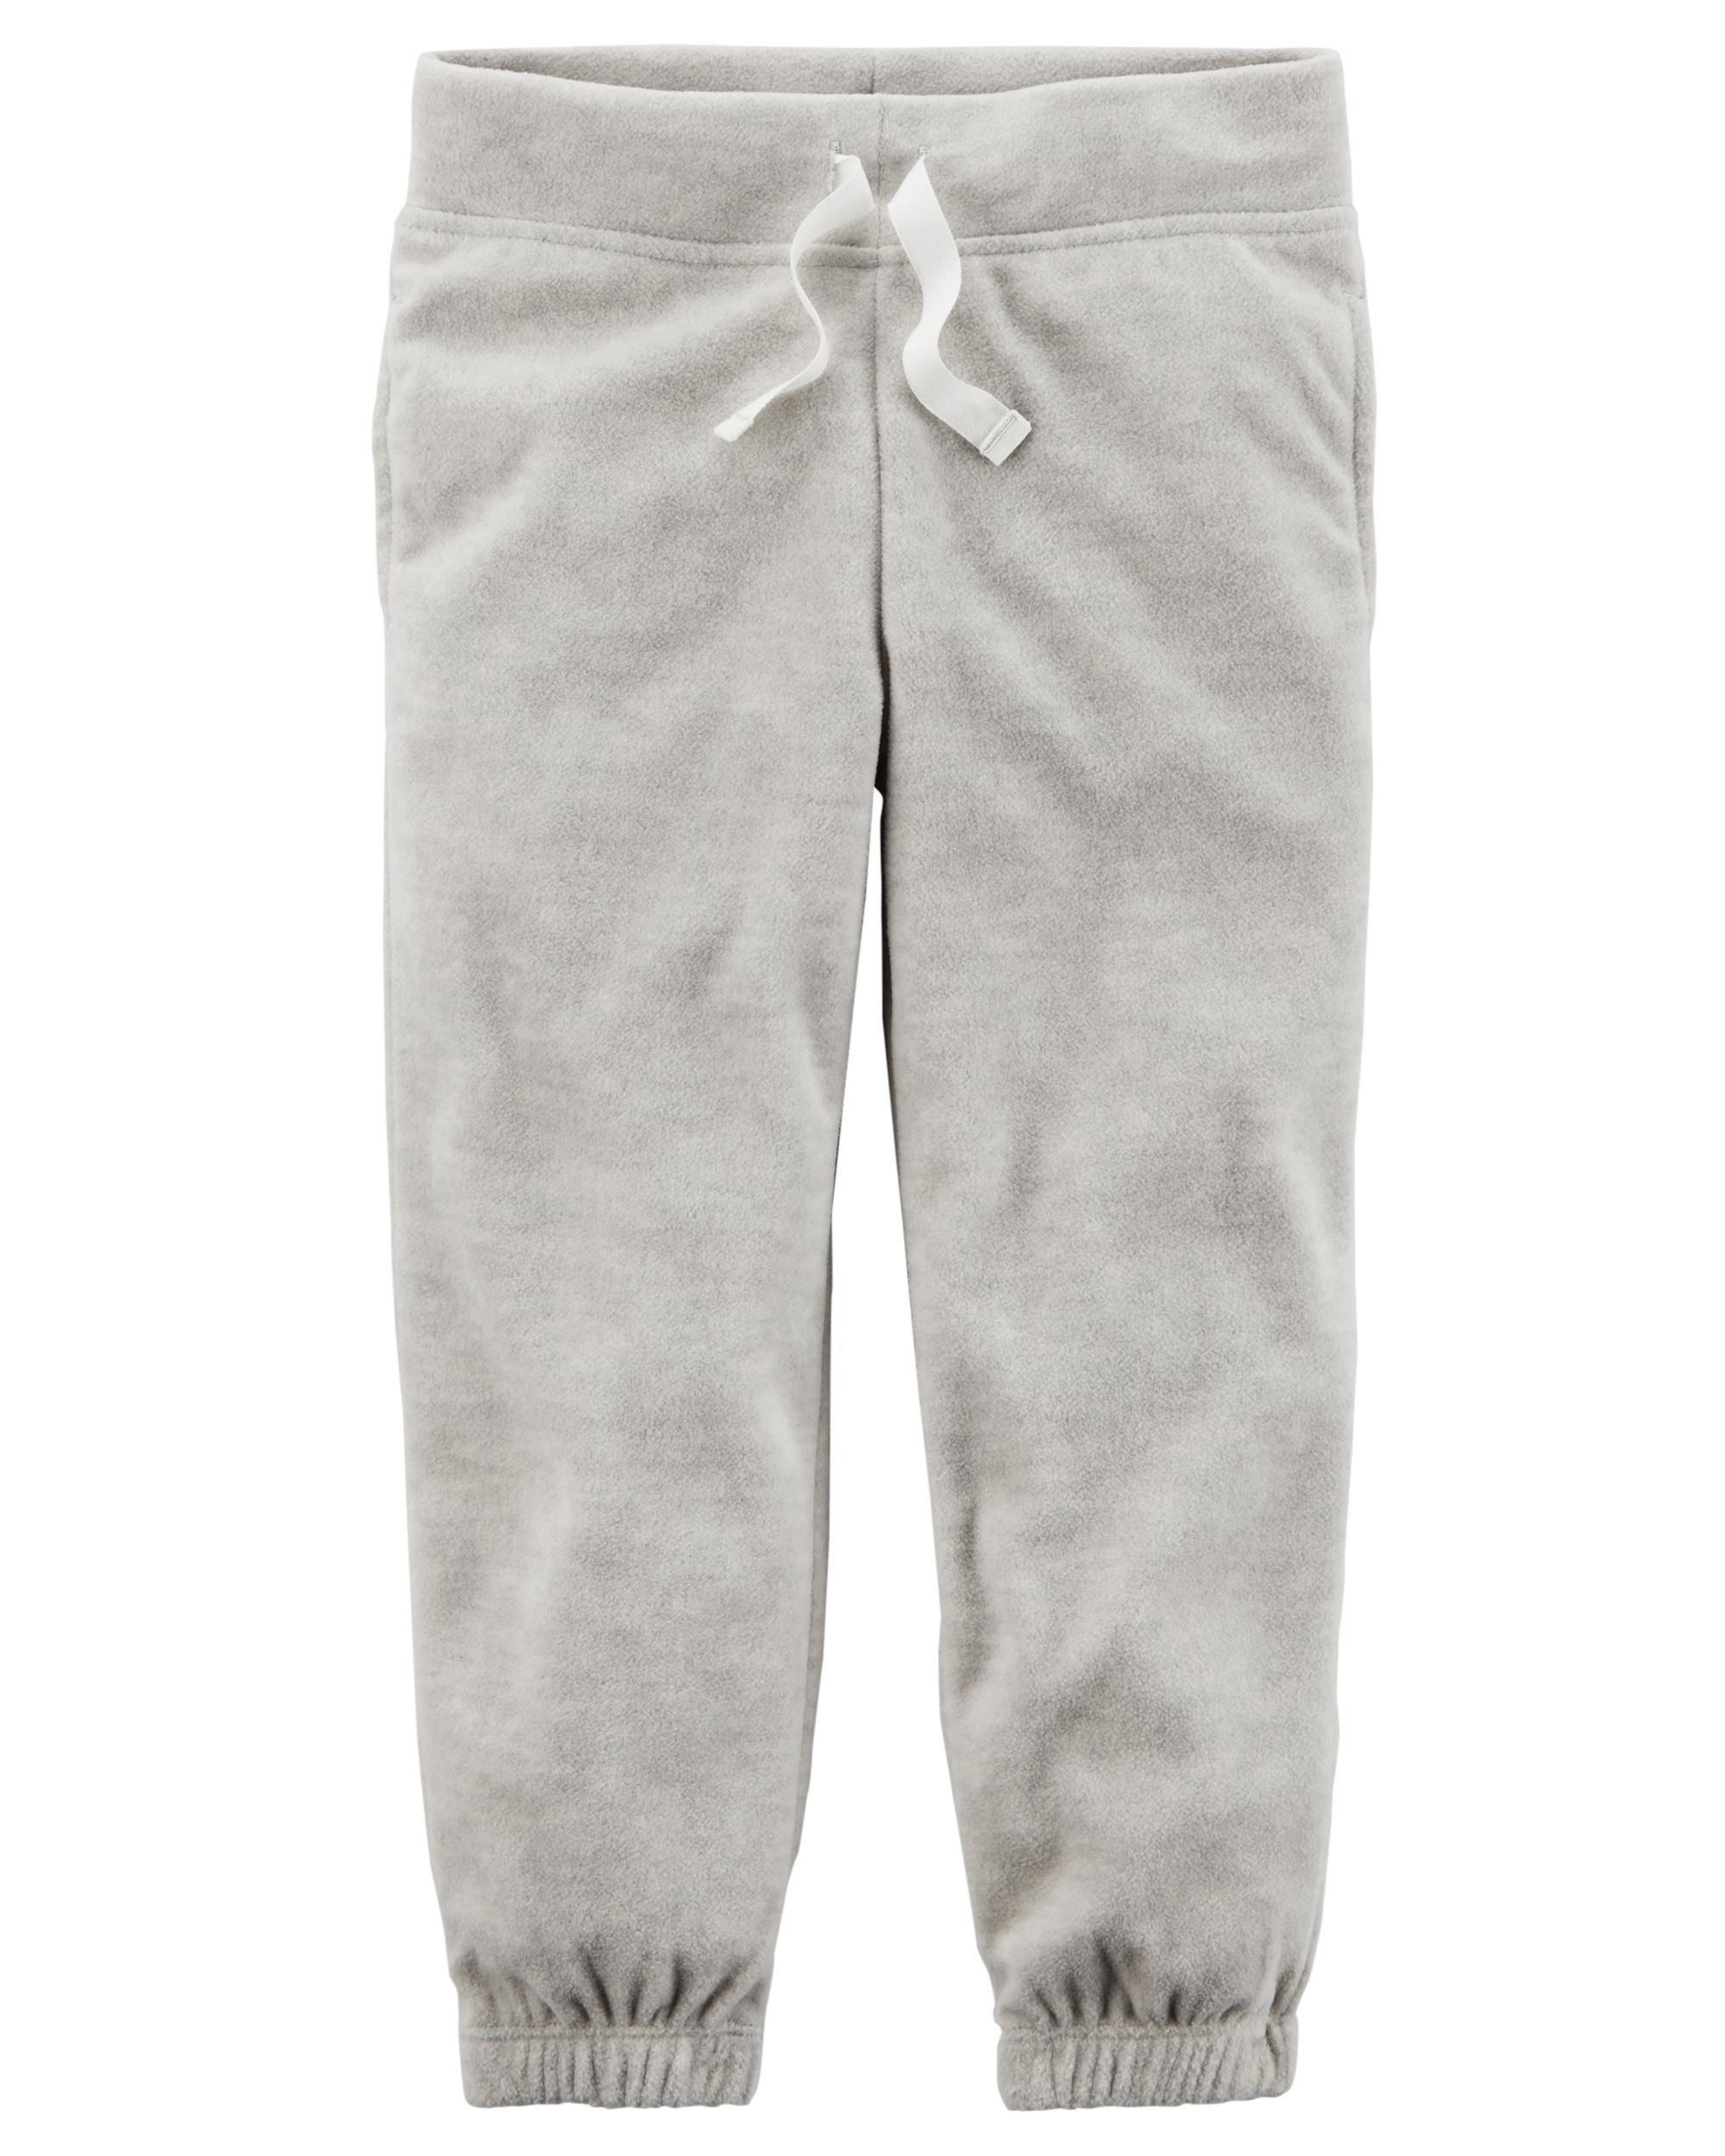 Carters Girls Pull-On Grey Fleece Joggers (3M)